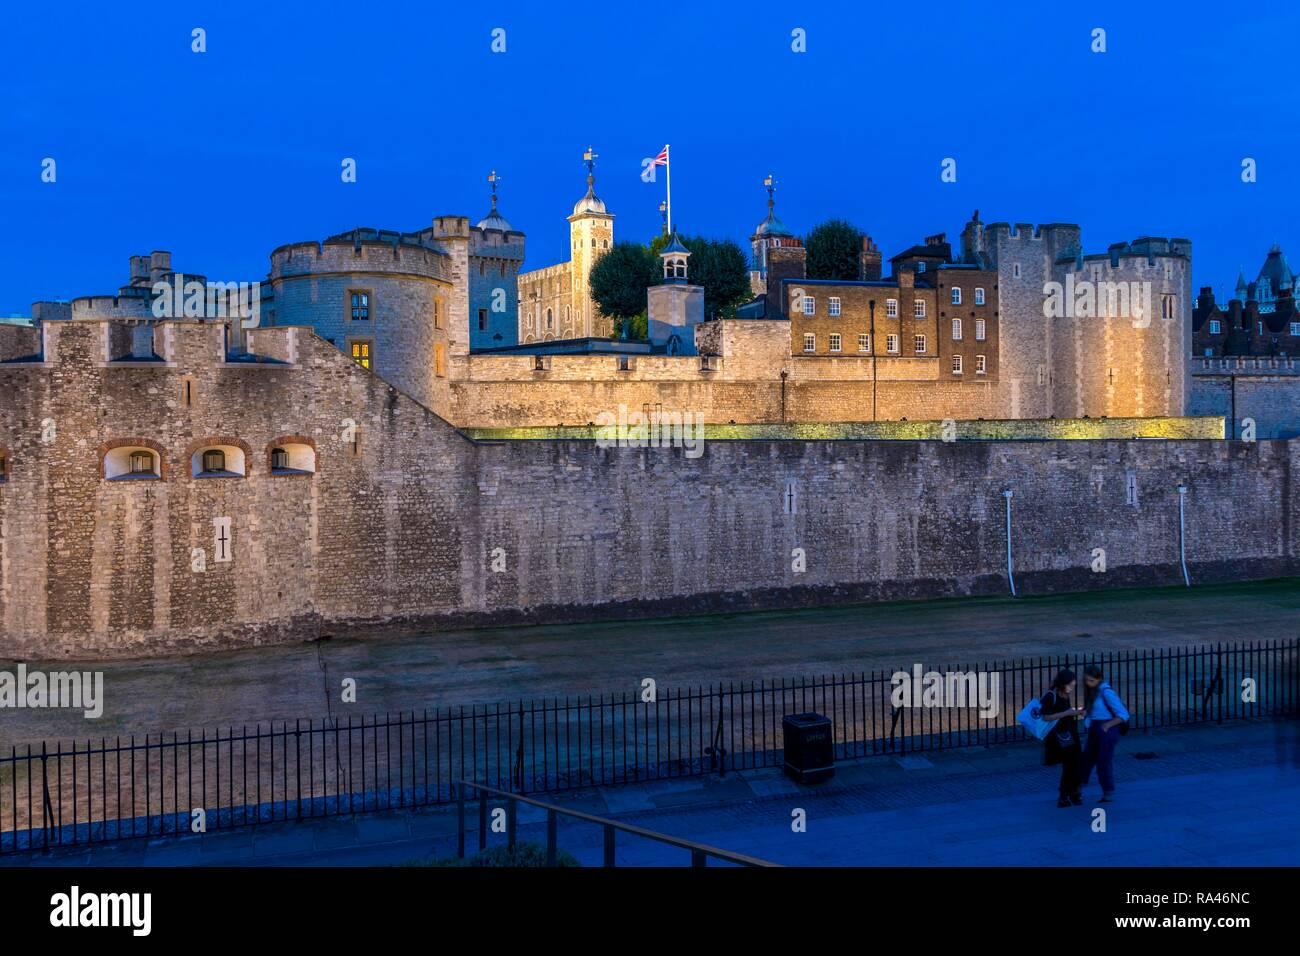 Illuminated Tower of London, night scene, blue hour, London, Great Britain Stock Photo